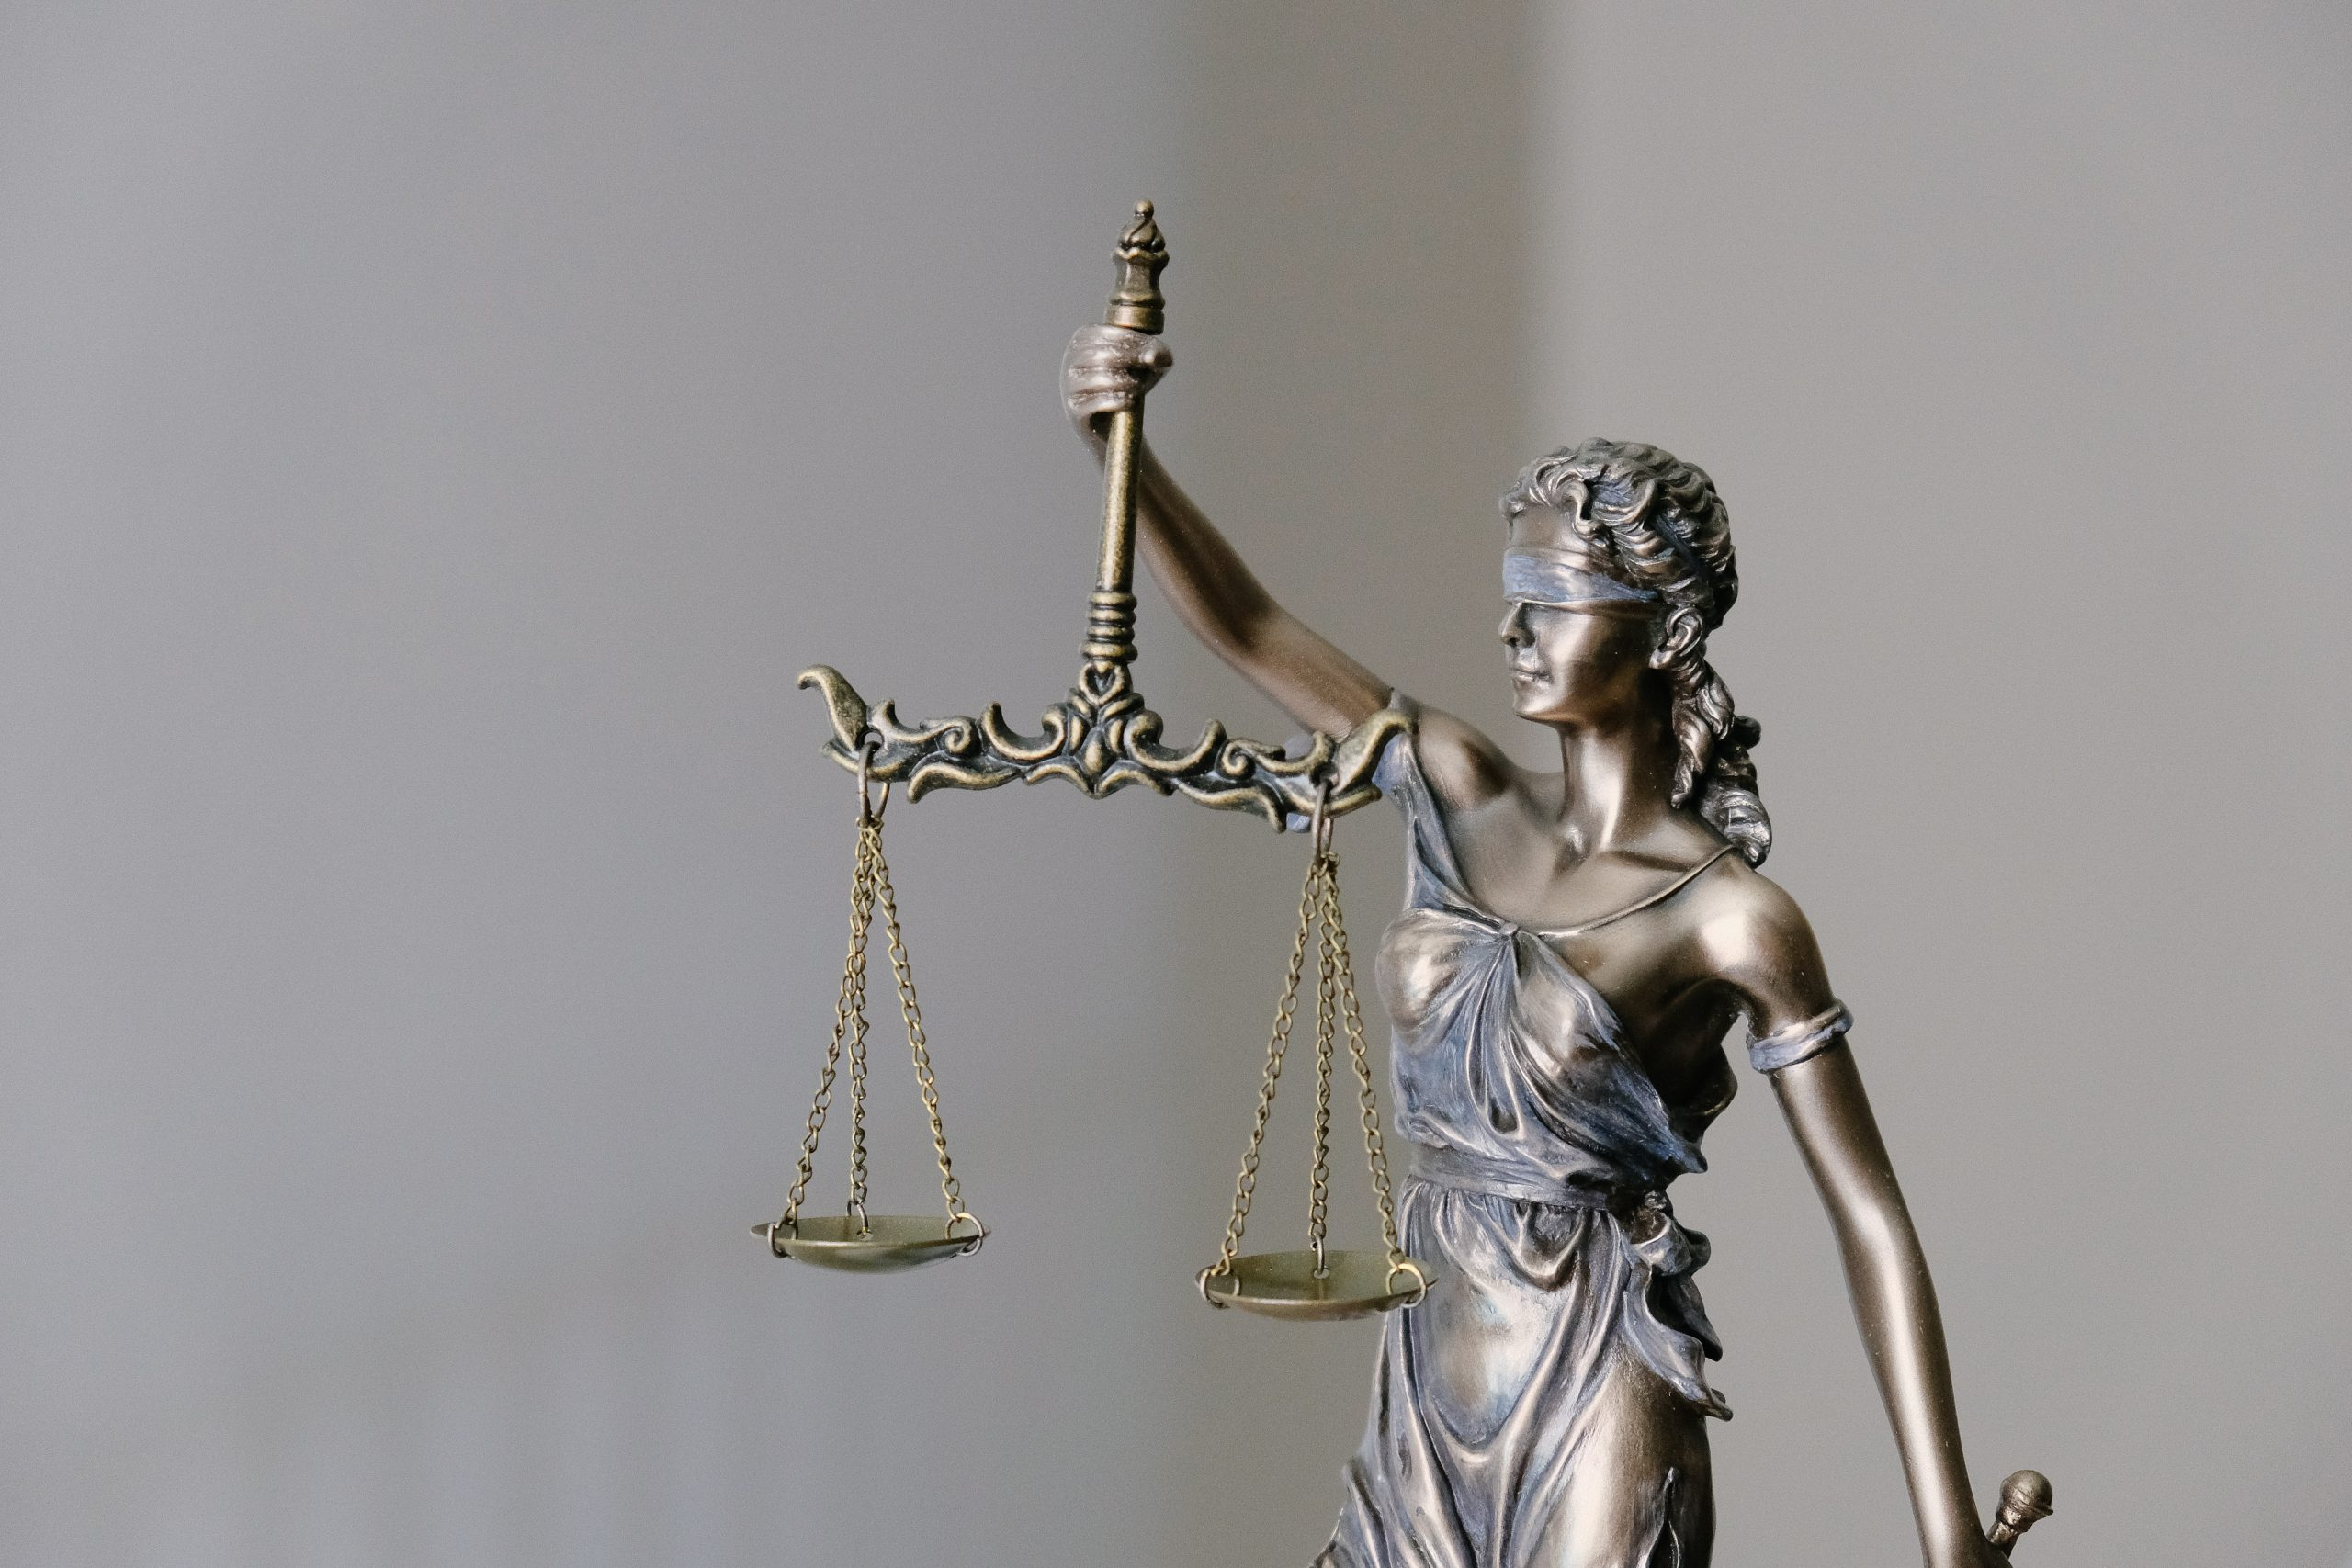 A statue representing Justice.